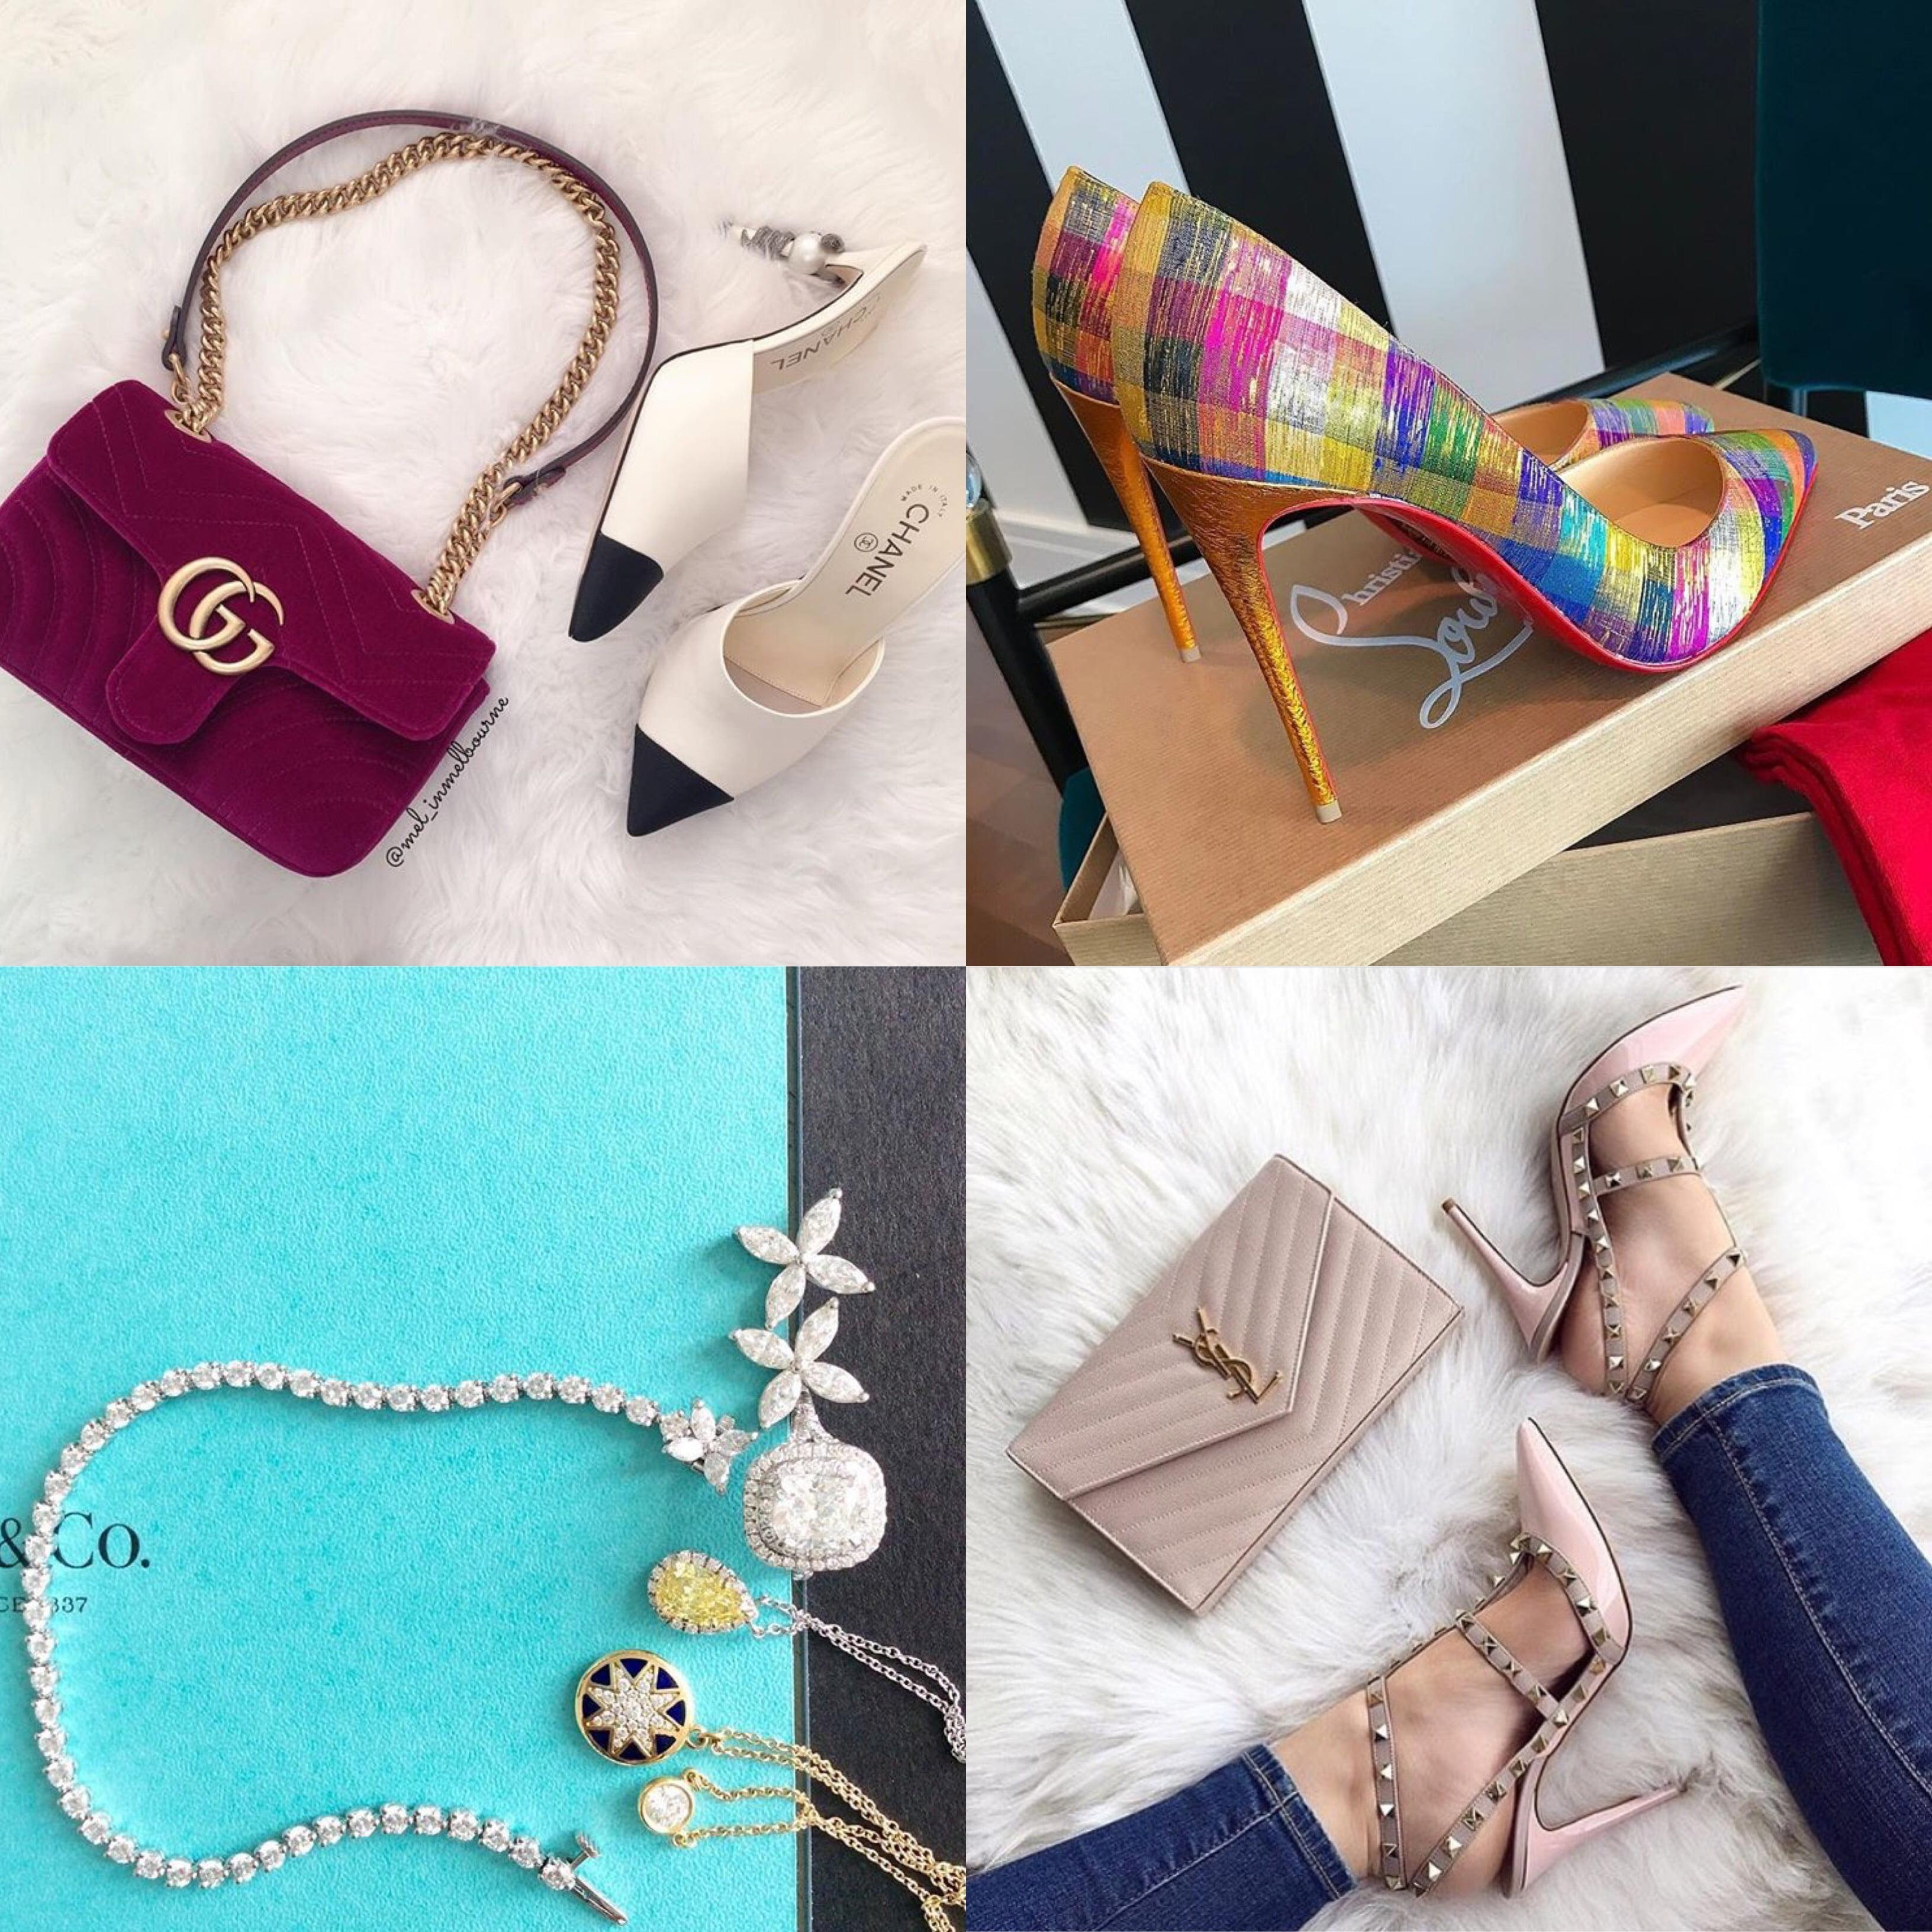 QUIZ TIME: Luxury Brand Preferences - PurseBop